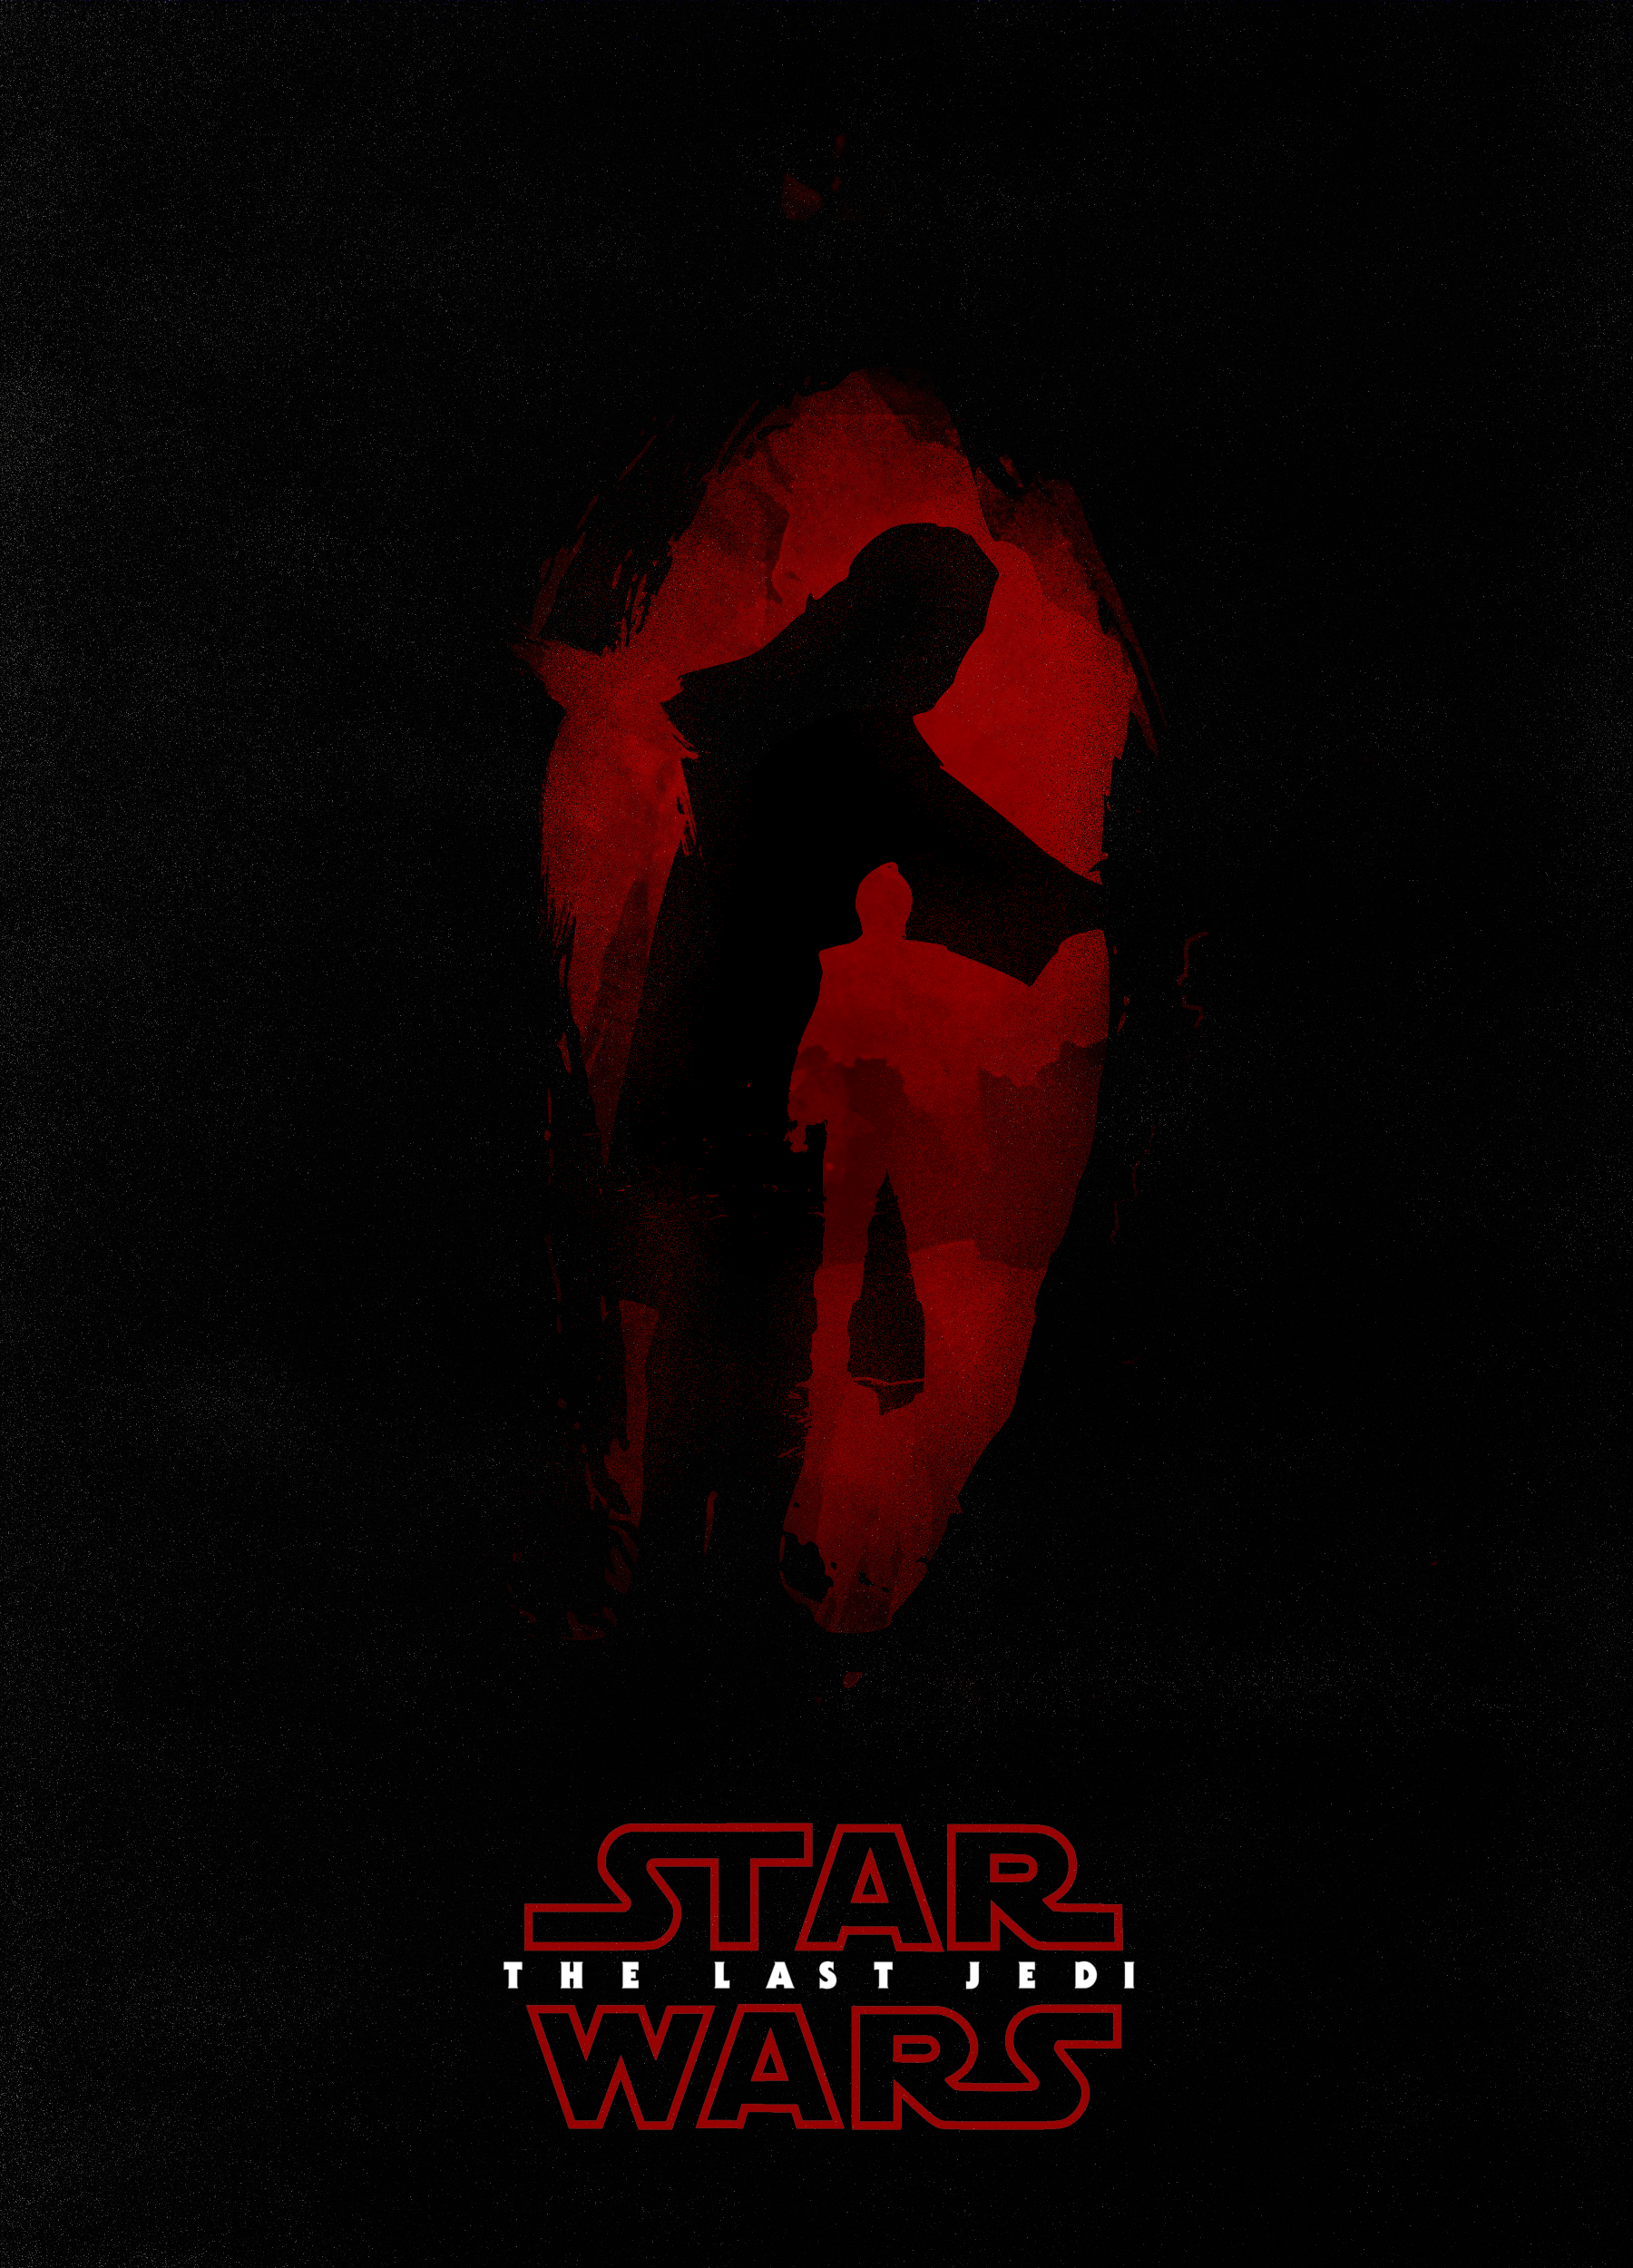 The Last Jedi Hd Wallpaper Posted By Ryan Mercado